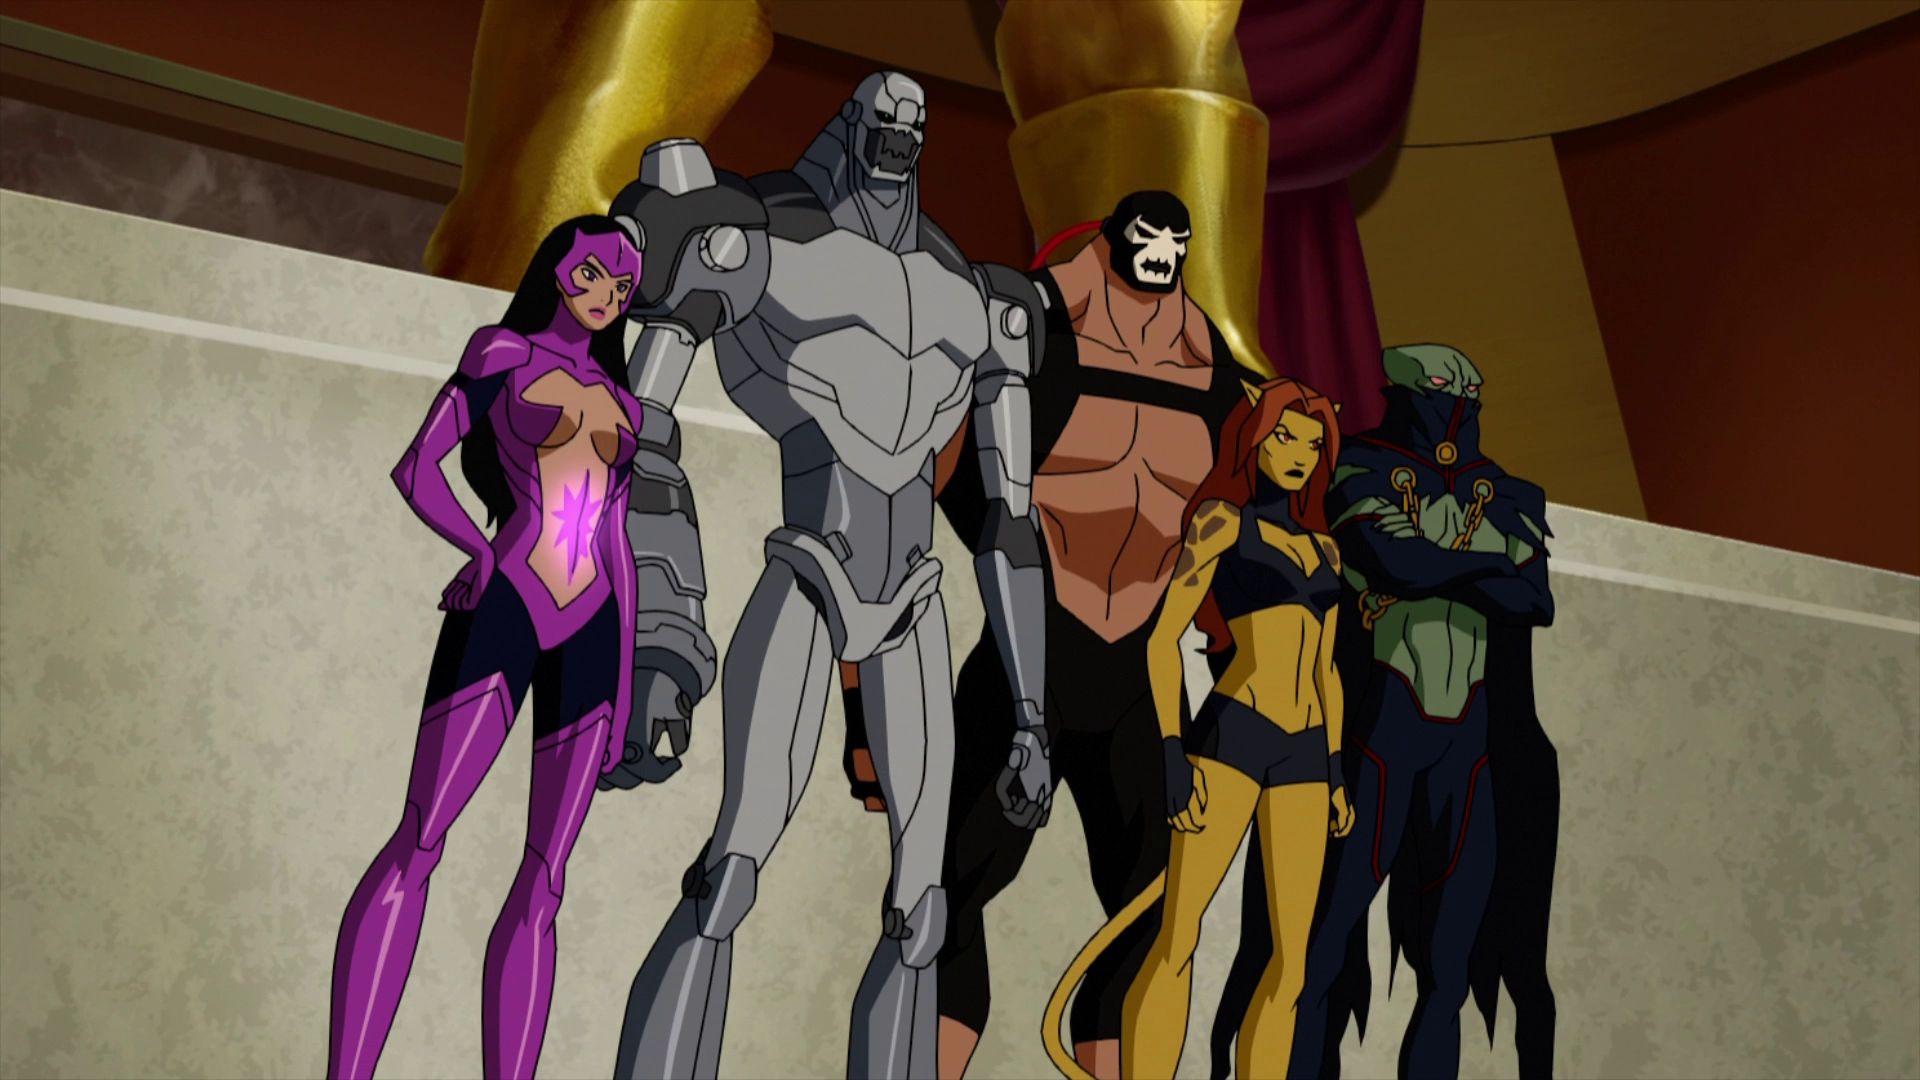 Animated Cheetah Wallpaper cartoon justice league: doom bane cheetah wallpaper